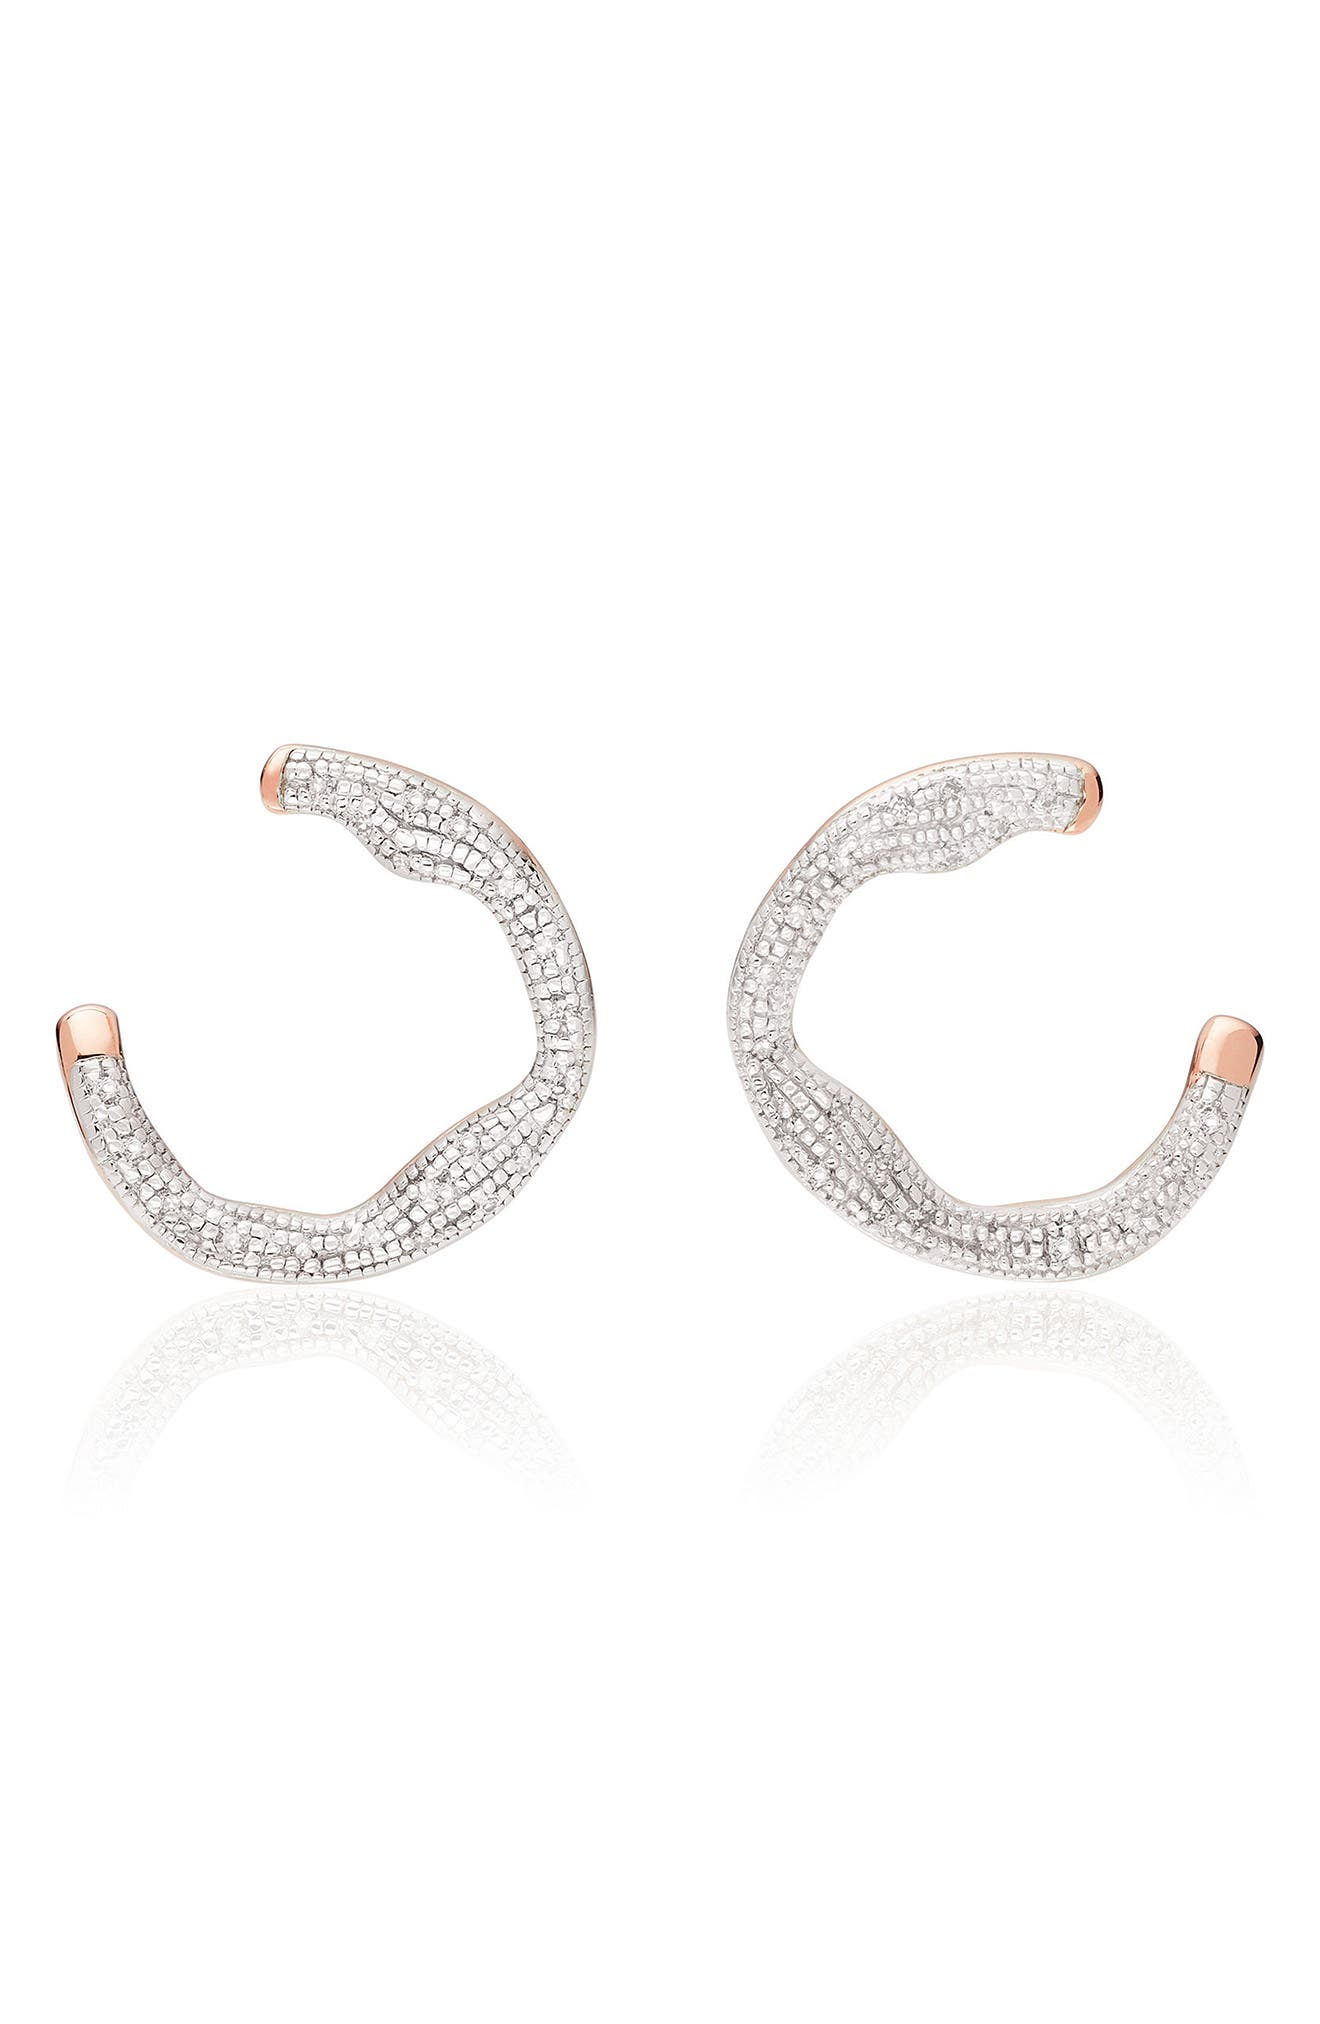 Riva Diamond Circle Wrap Earrings,                             Main thumbnail 1, color,                             Rose Gold